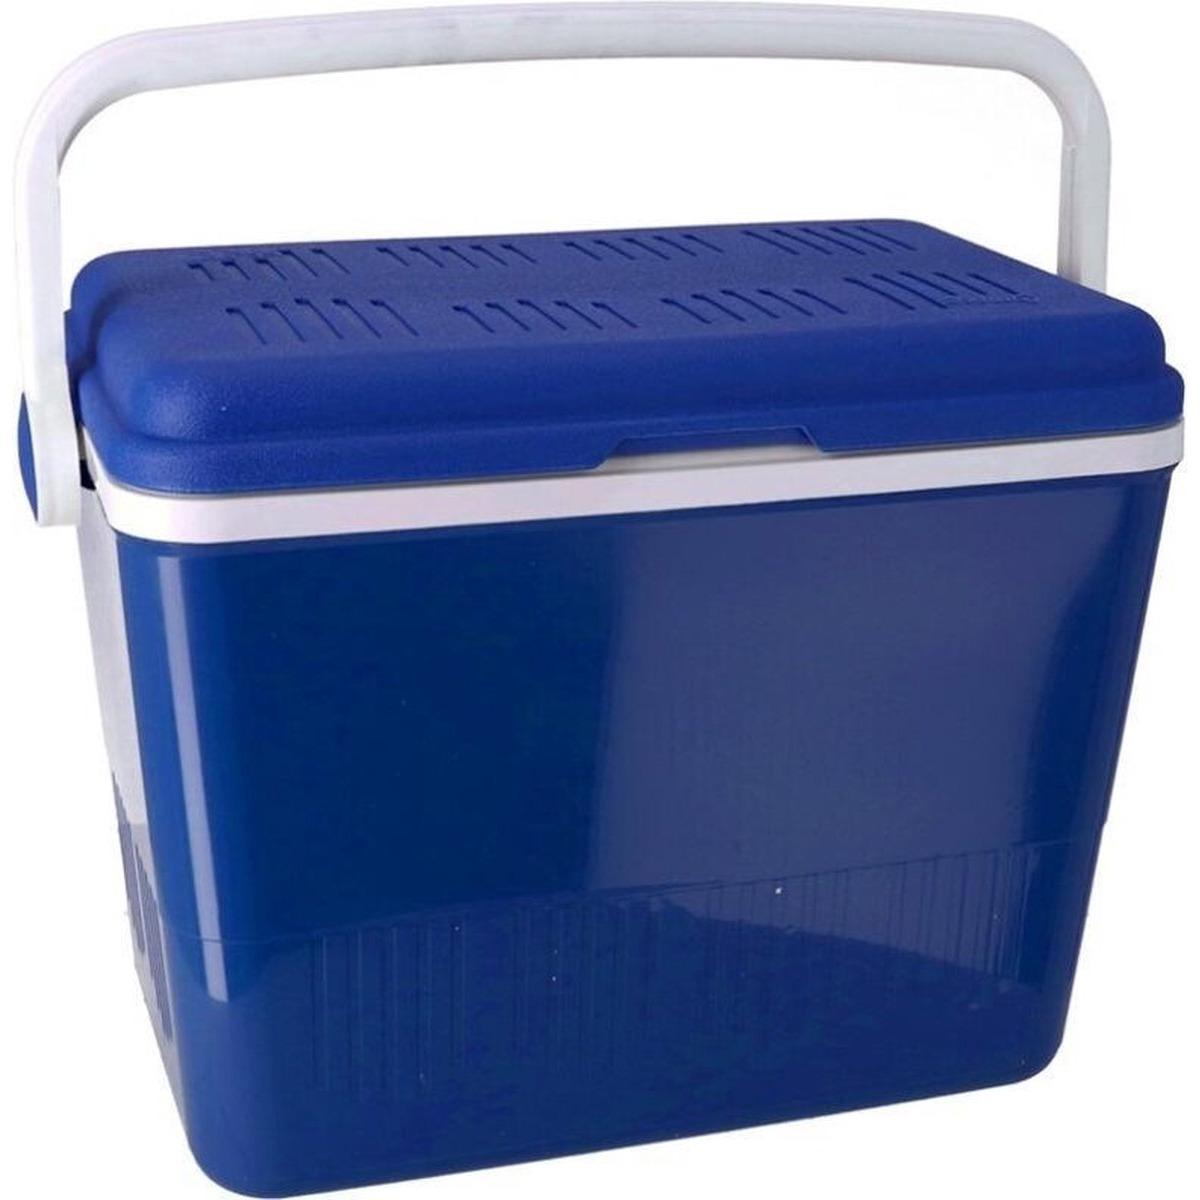 Koelbox 2-in-1 donkerblauw 42 liter 35 x 55 x 39 cm